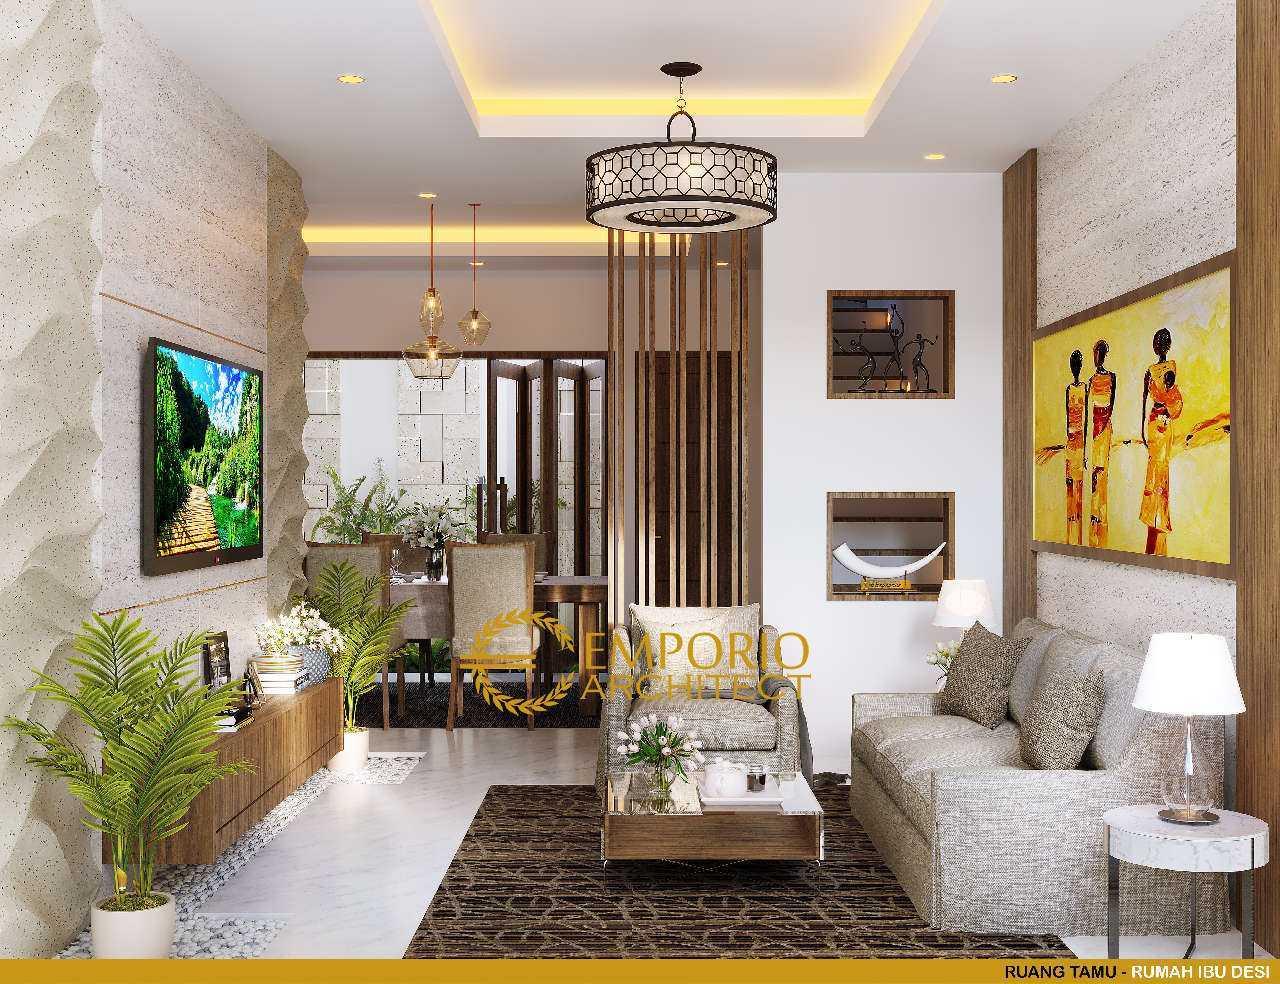 Emporio Architect Jasa Arsitek Badung Desain Rumah Modern 2 Lantai 765 @ Badung, Bali Kabupaten Badung, Bali, Indonesia Kabupaten Badung, Bali, Indonesia Emporio-Architect-Jasa-Arsitek-Badung-Desain-Rumah-Modern-2-Lantai-765-Badung-Bali  87394